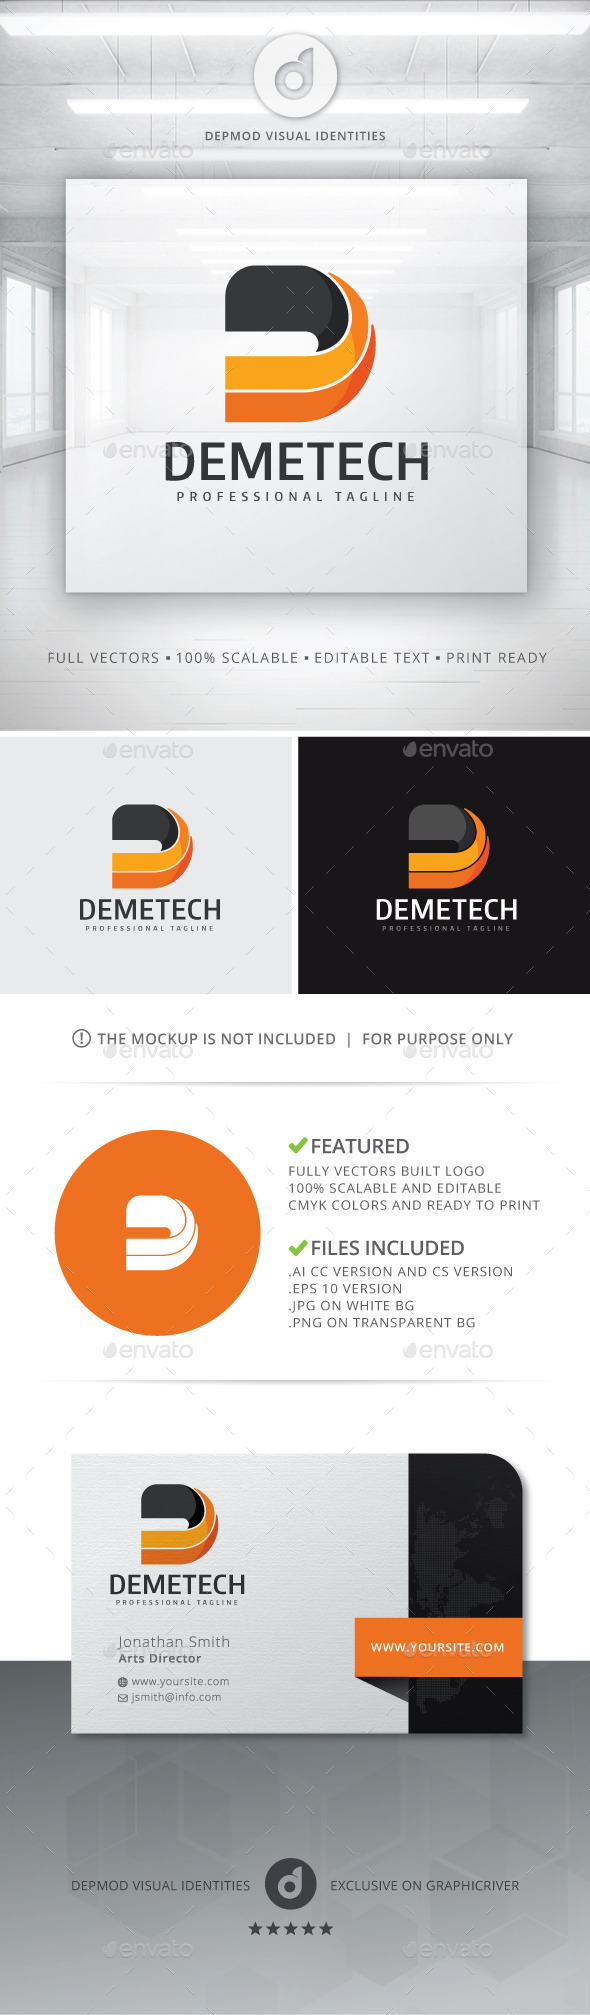 GraphicRiver Demetech Logo 10799424